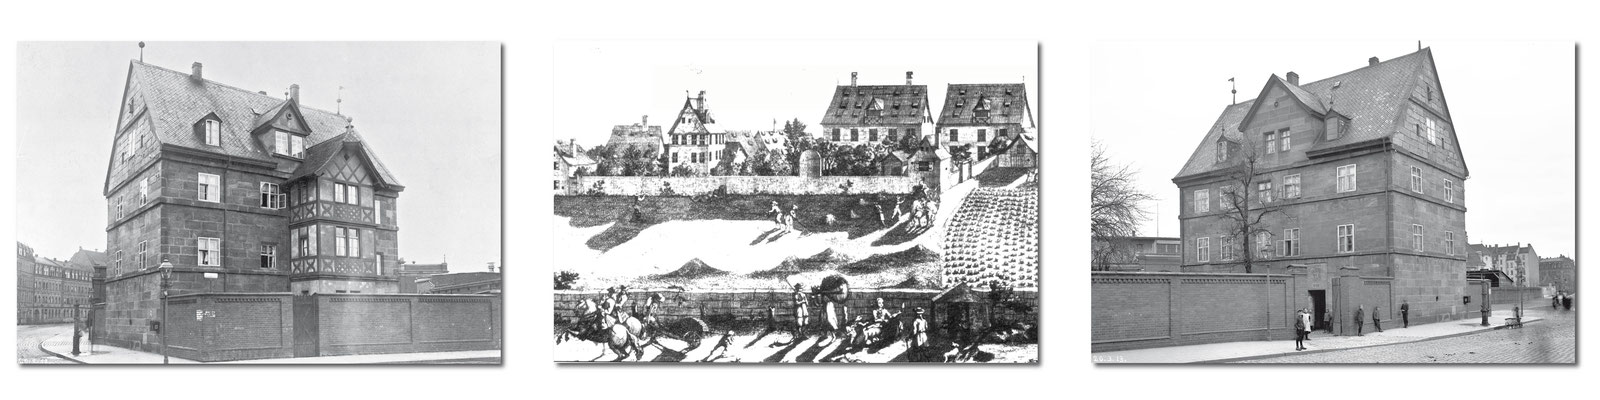 Nützel Schloss, Rothenburger Straße